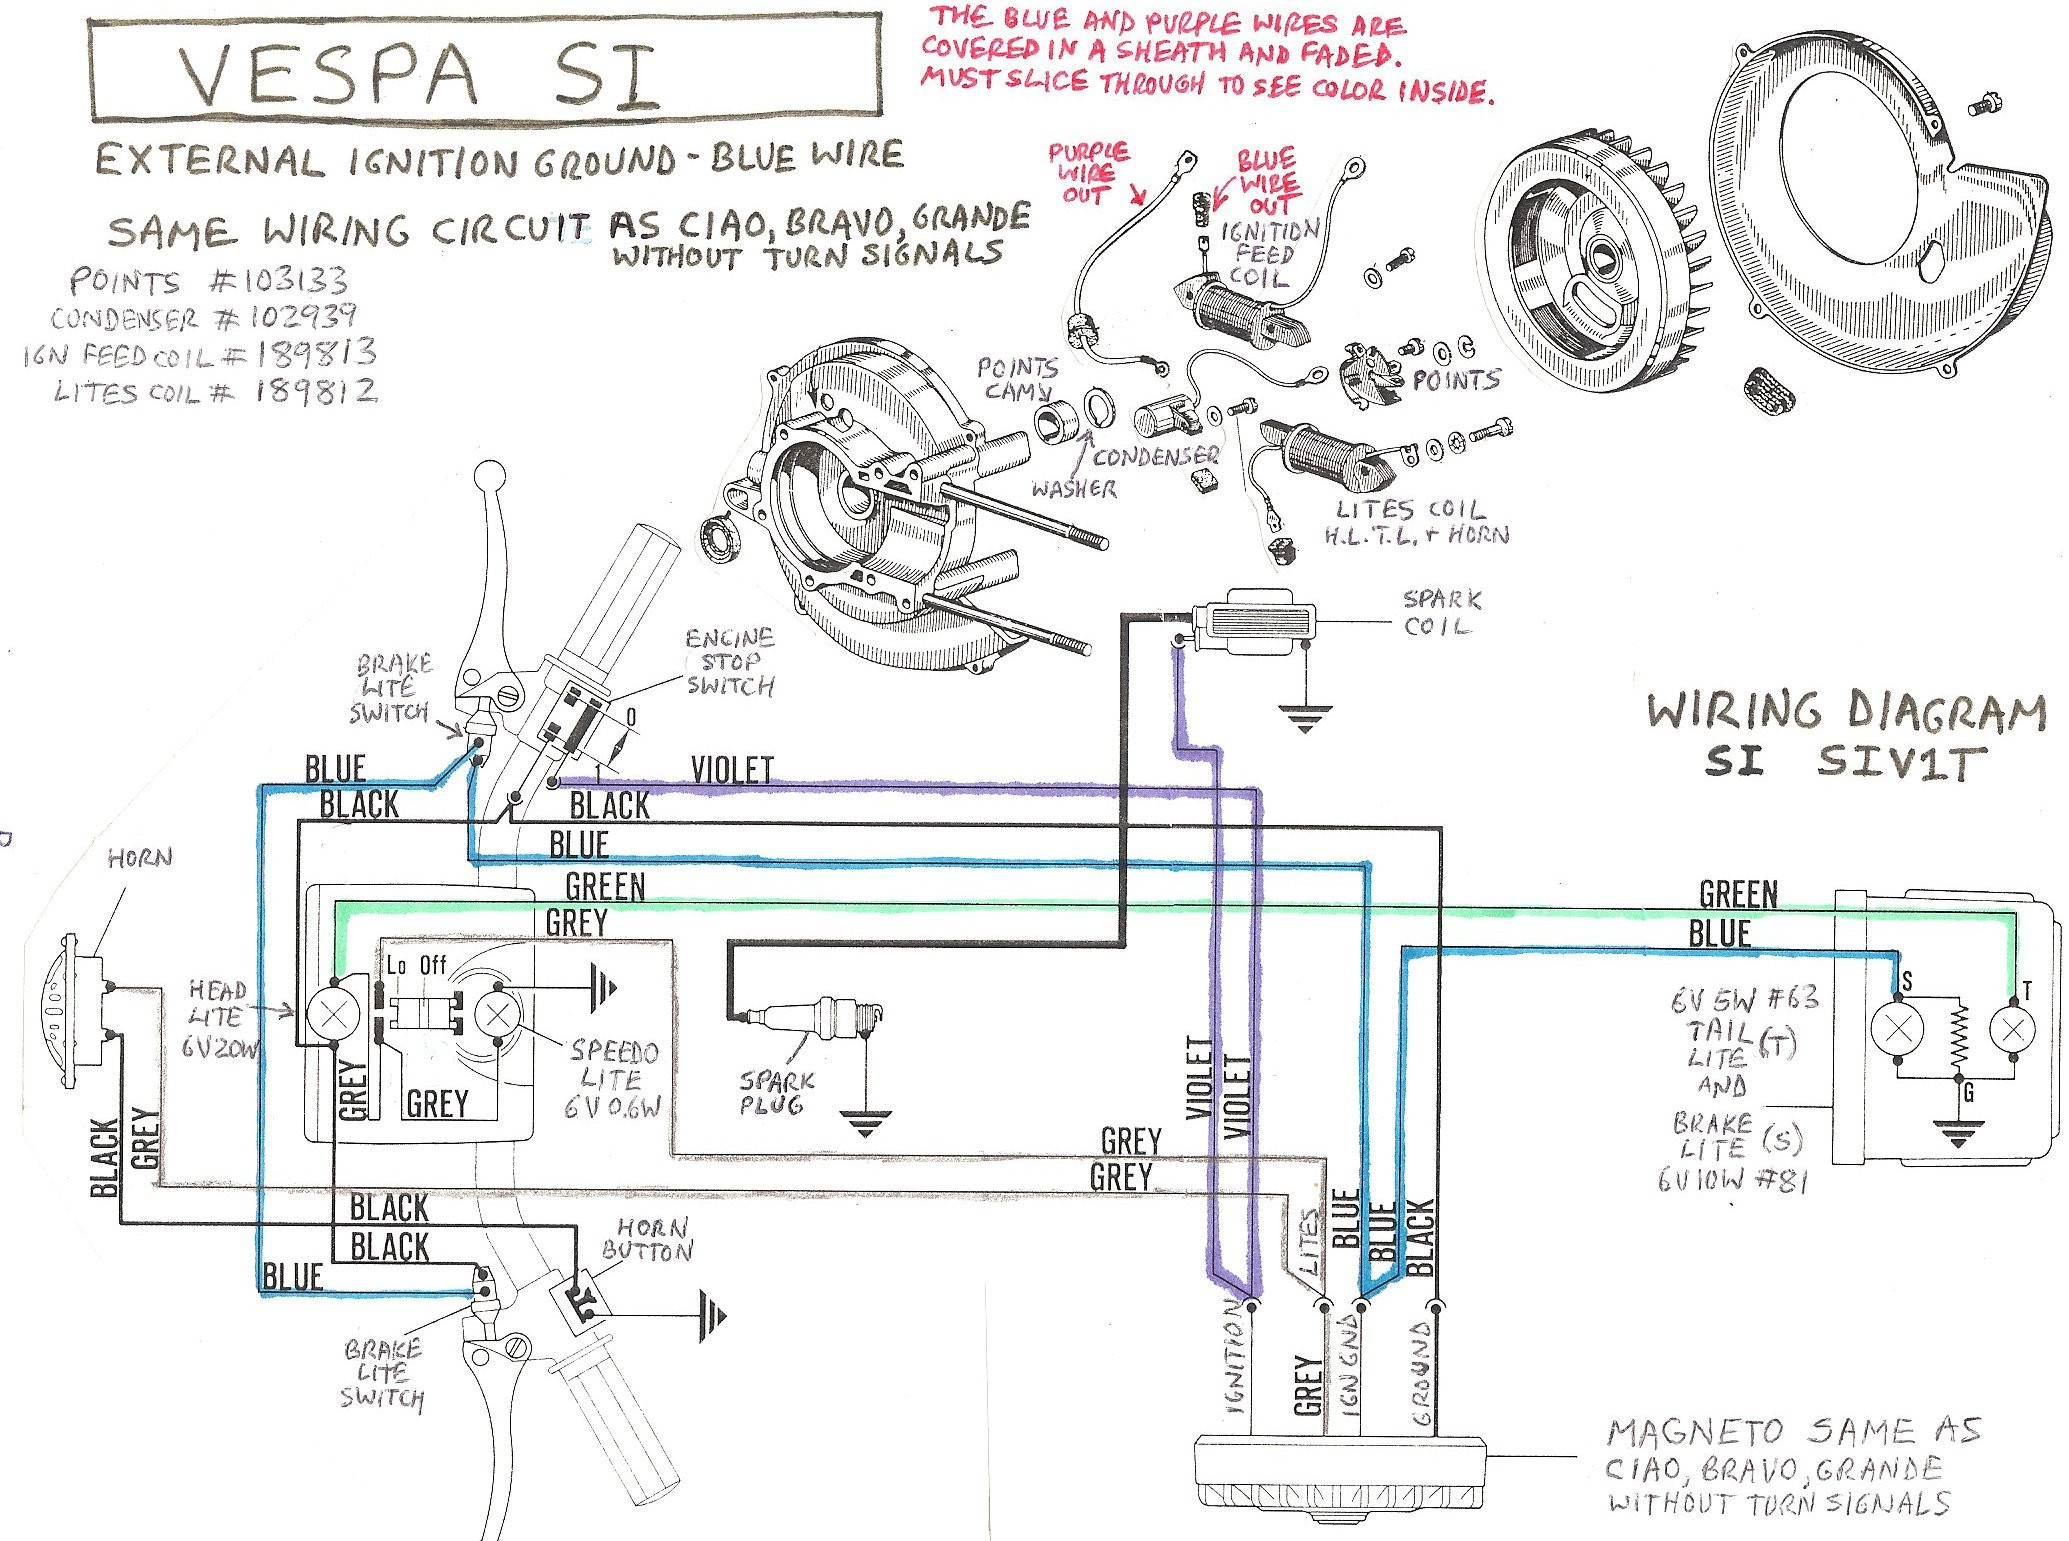 Winch Contactor Wiring Diagram Luxury solenoid Wiring Diagram Diagram Of Winch Contactor Wiring Diagram